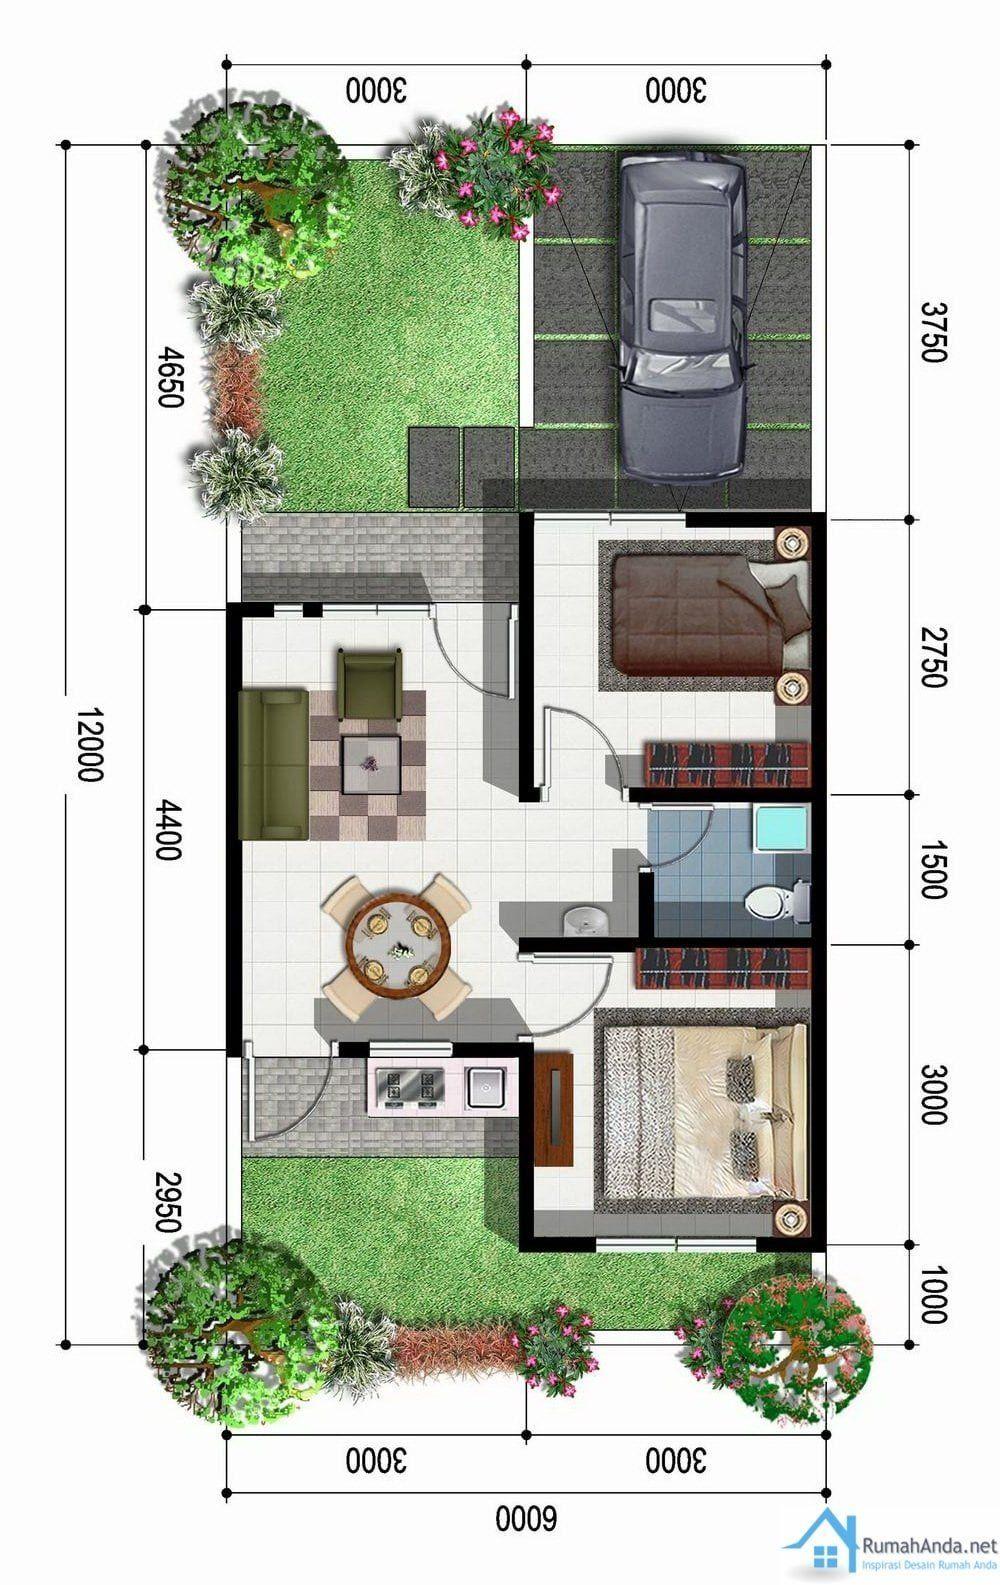 denah rumah ukuran 5x10 1 lantai